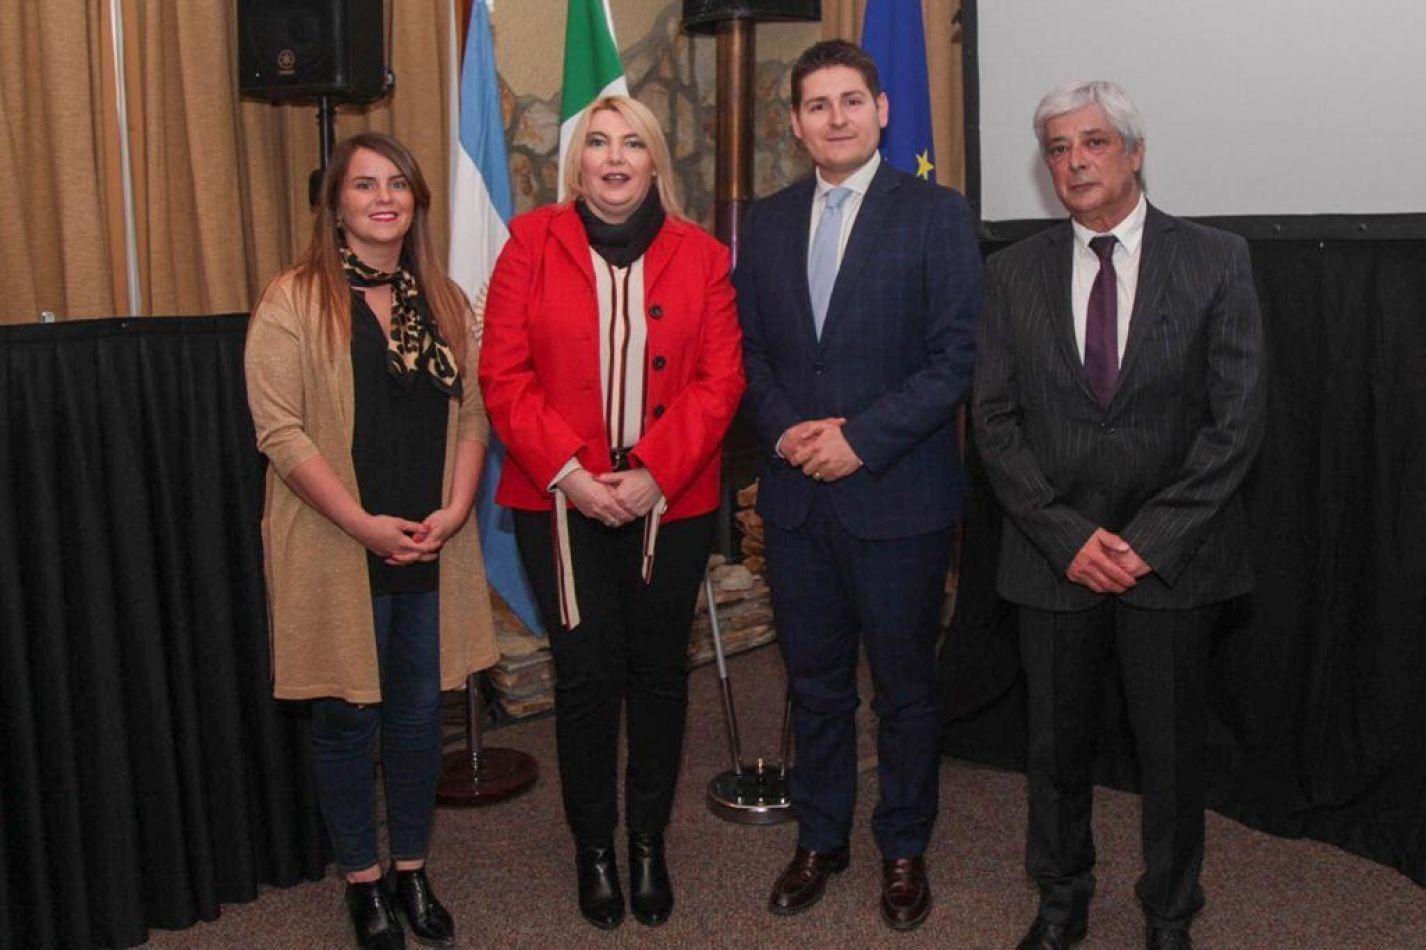 Se inauguró la agencia Consular Honoraria de Italia en Ushuaia